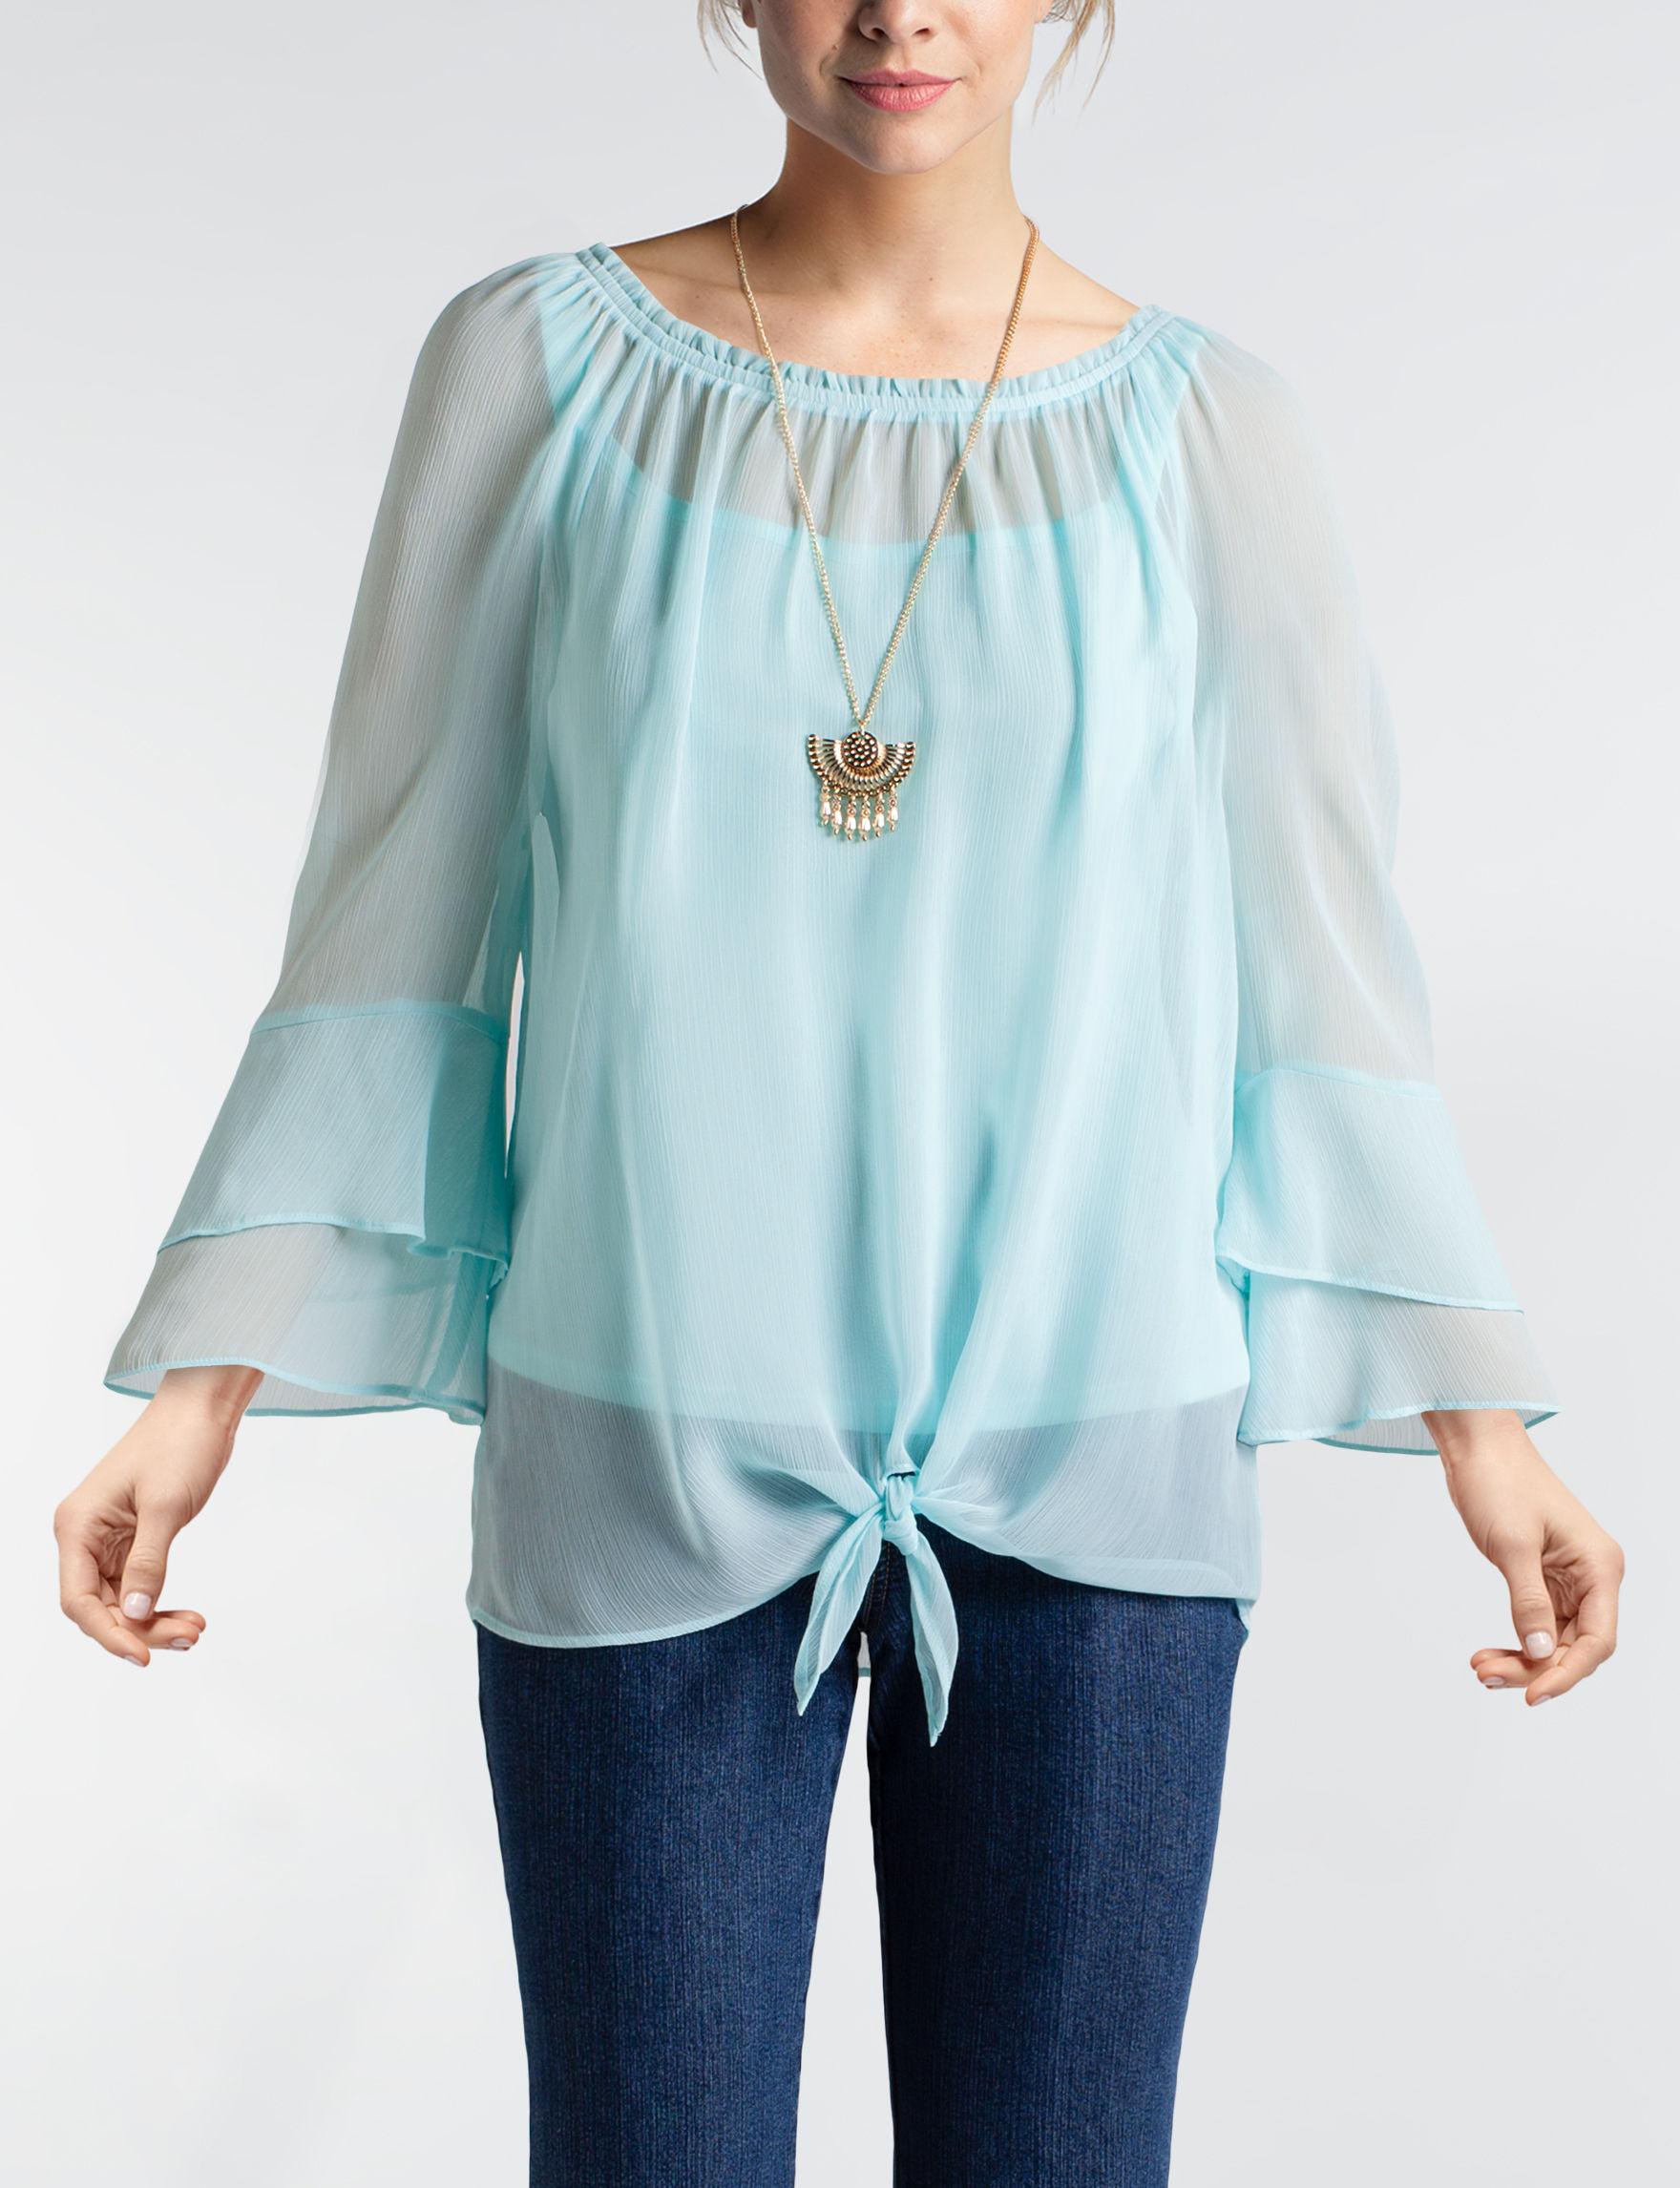 A. Byer Aqua Shirts & Blouses